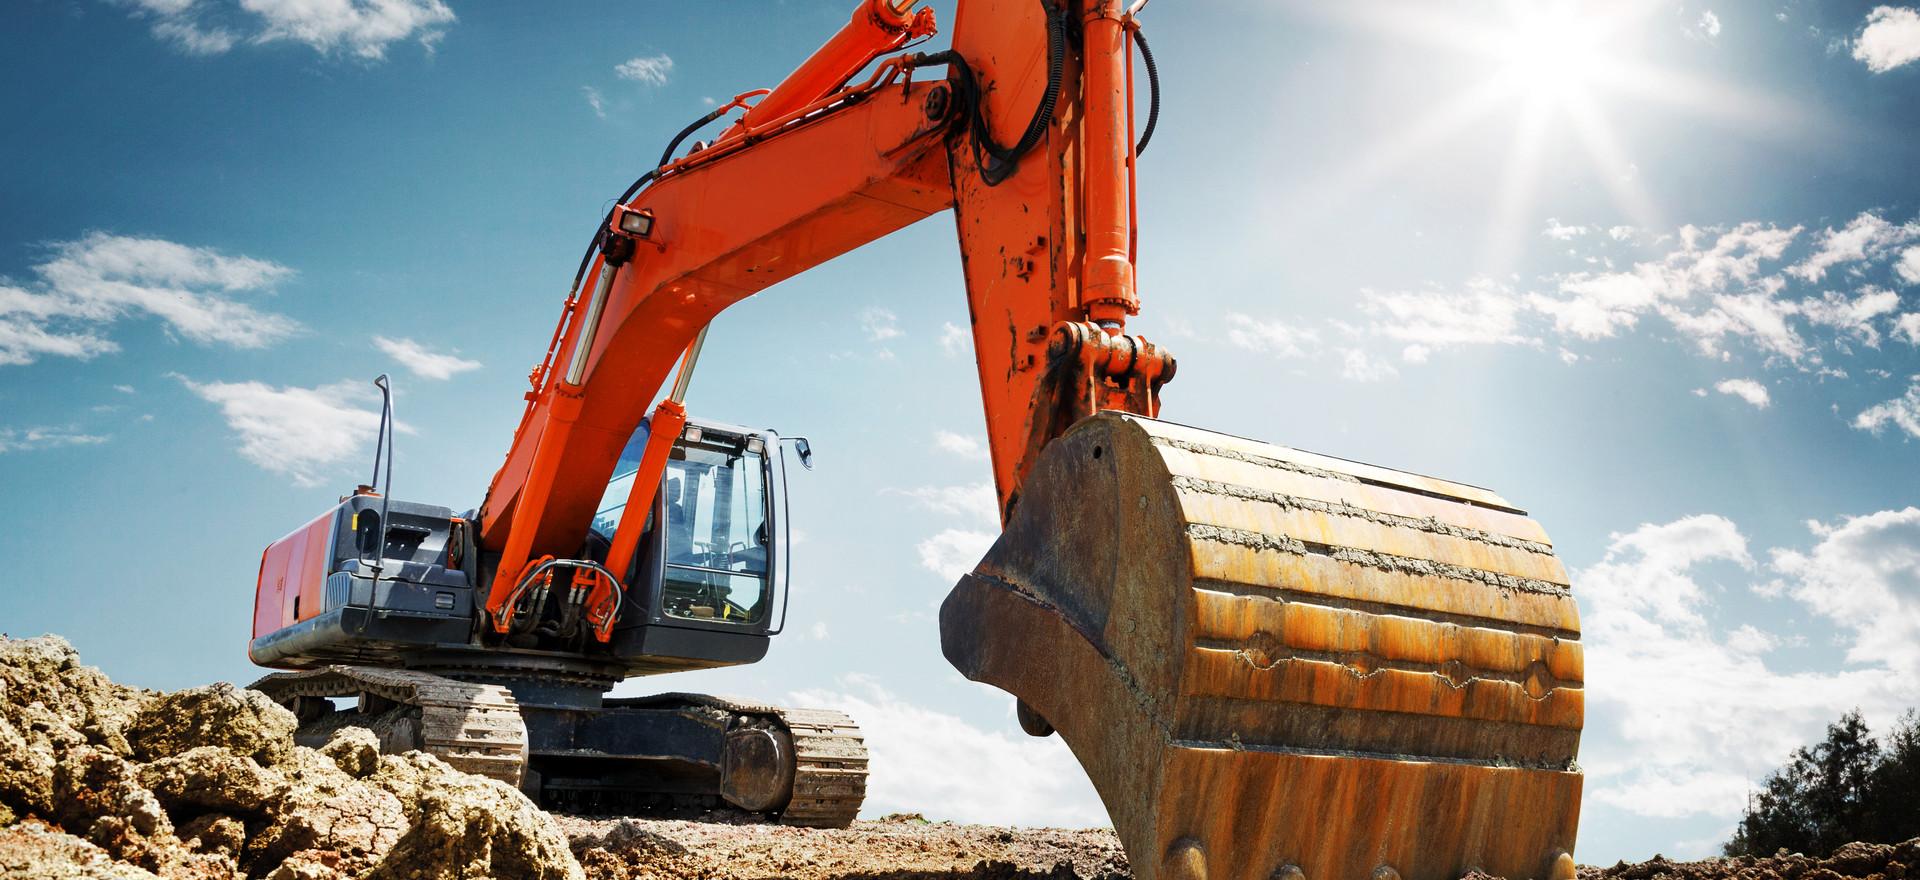 Crawler excavator front view digging on